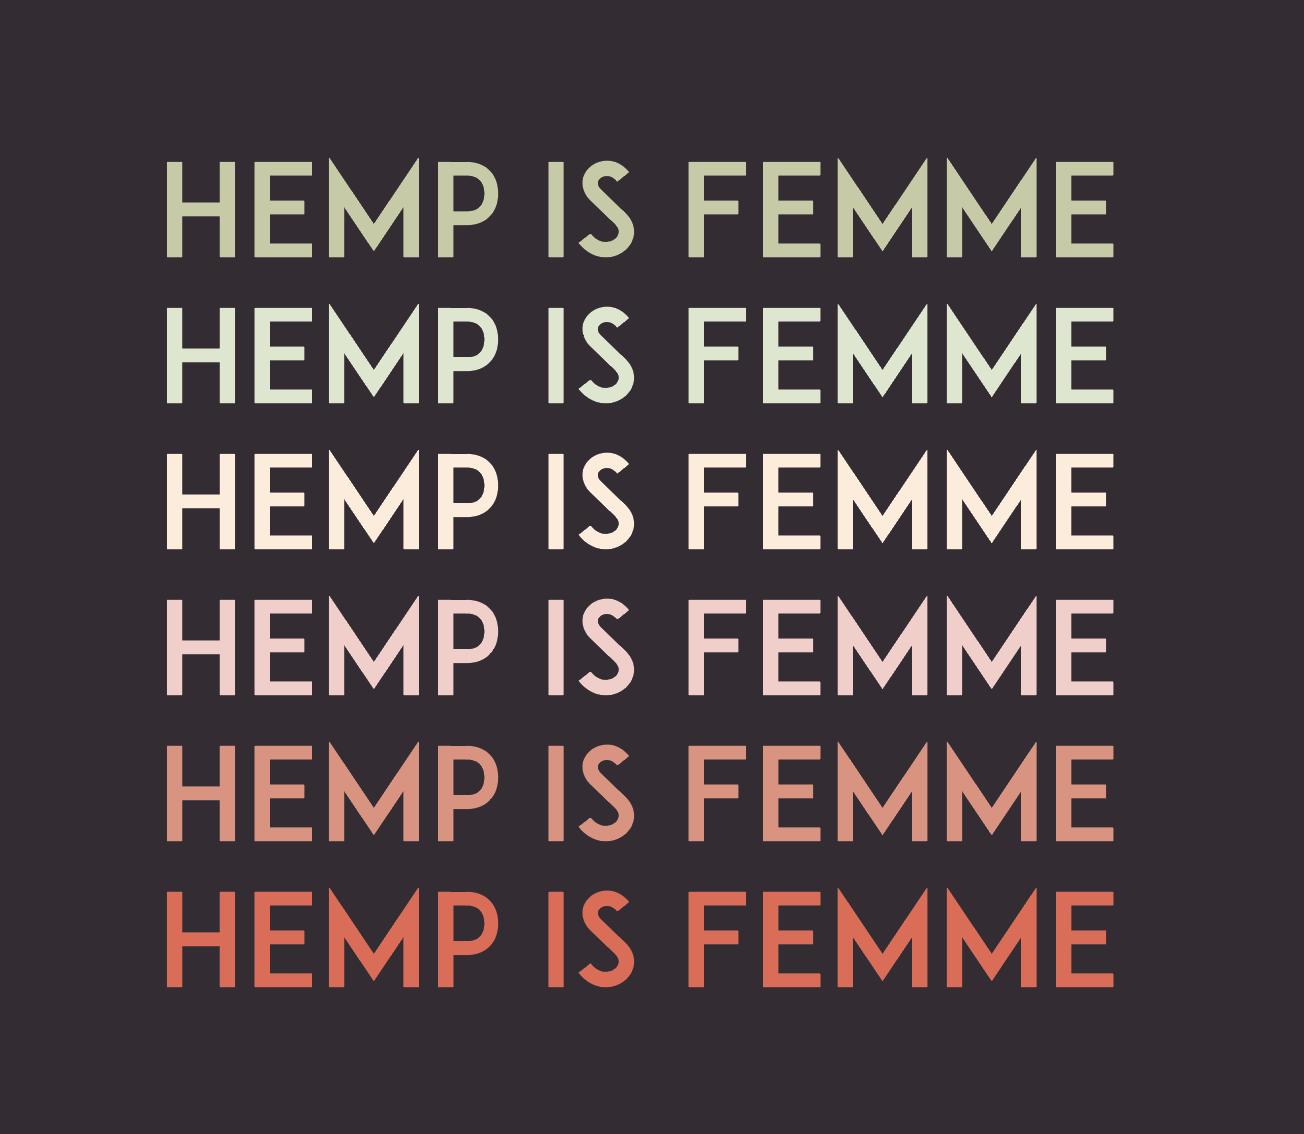 Hemp Is Femme Repeat Black Background